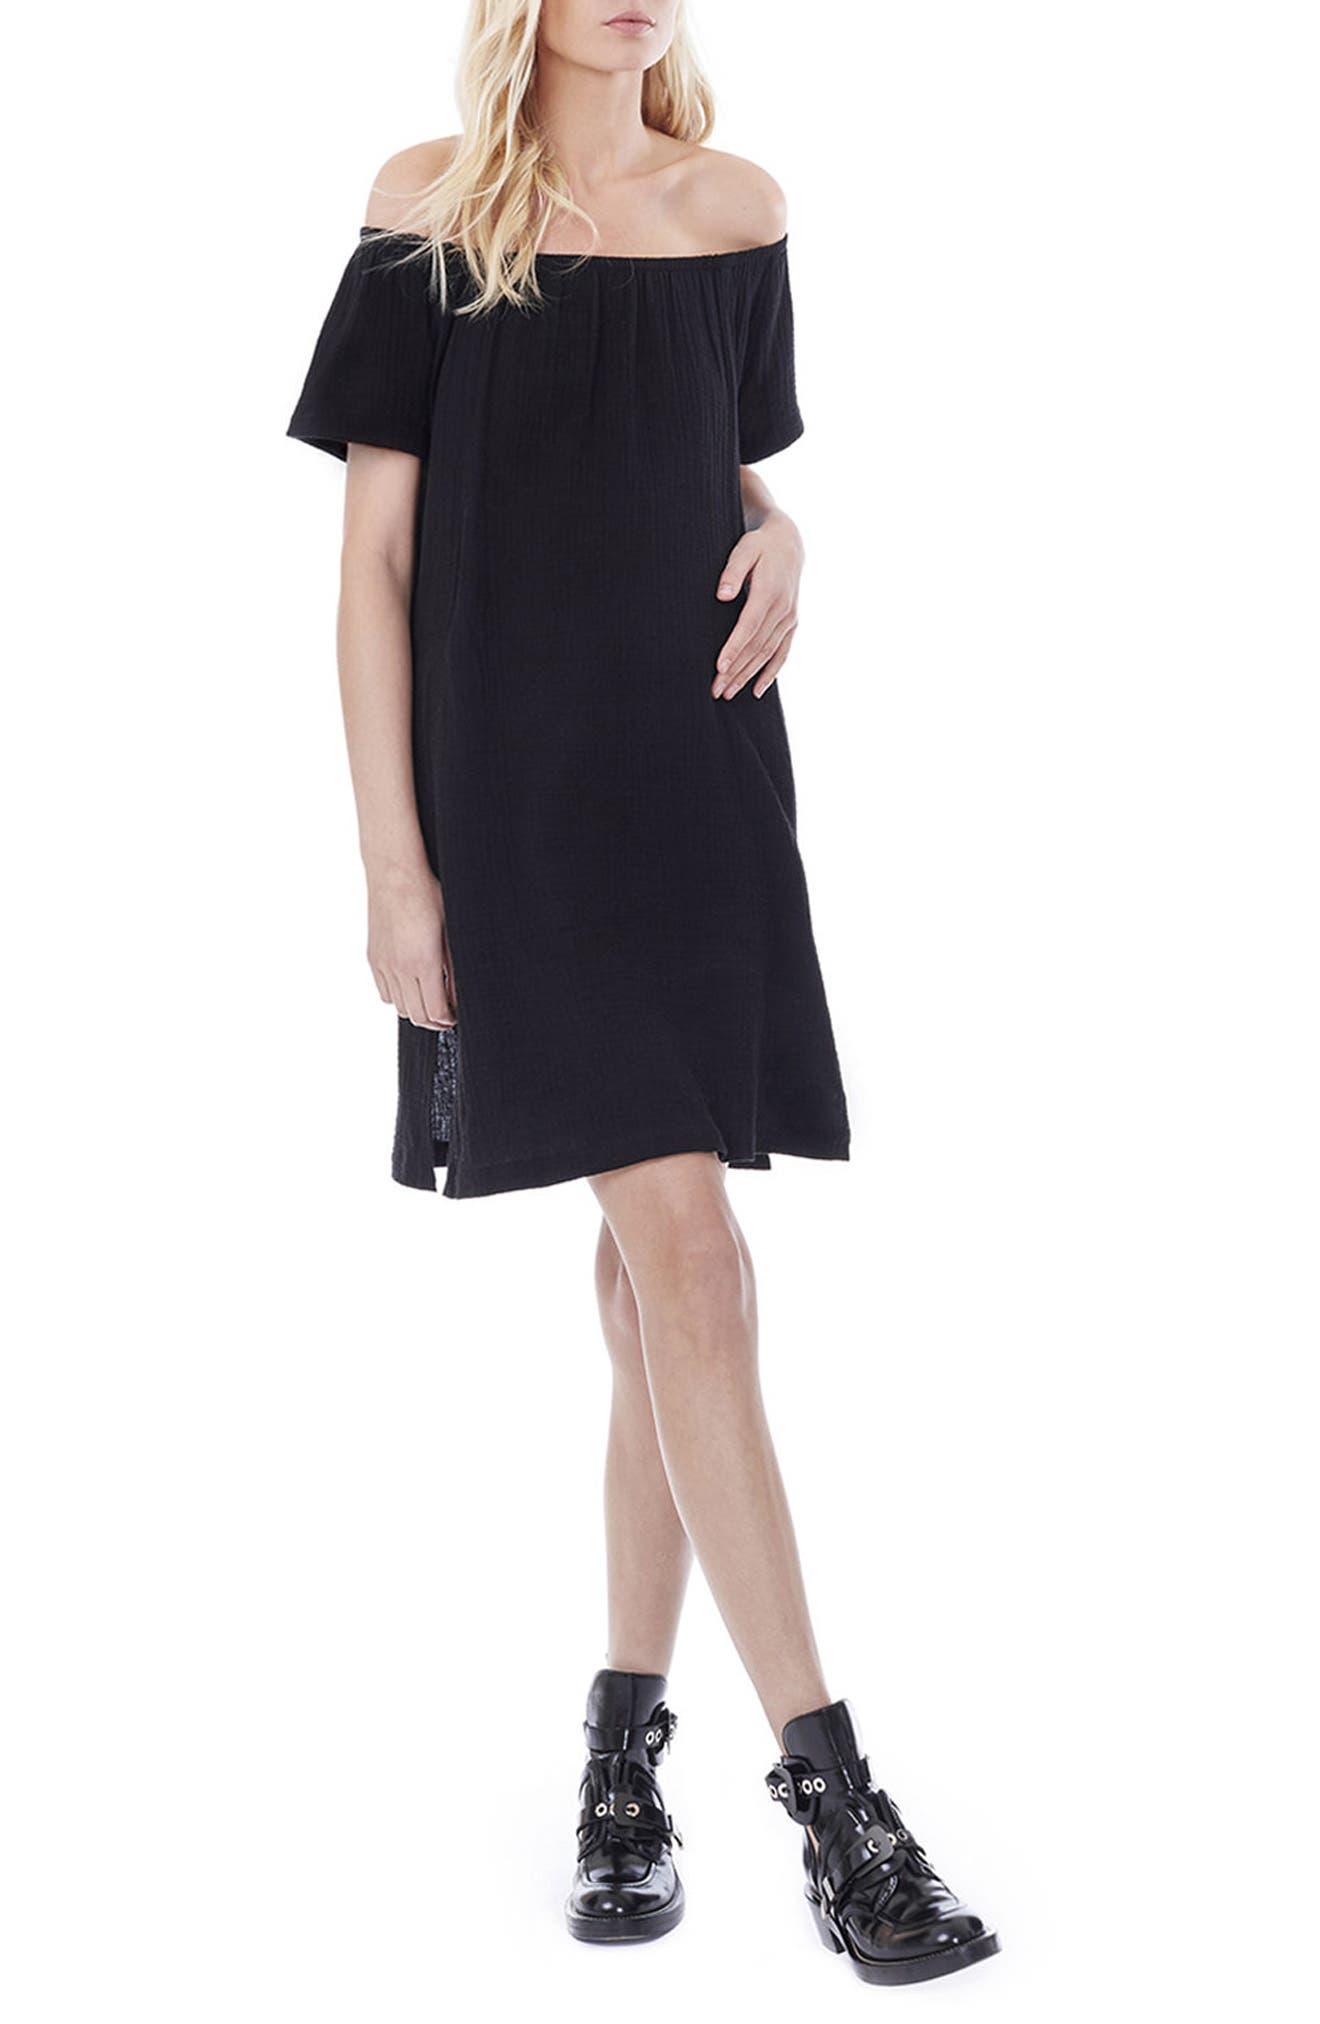 Loyal Hana Ariel Off The Shoulder Maternity/nursing Dress, Black